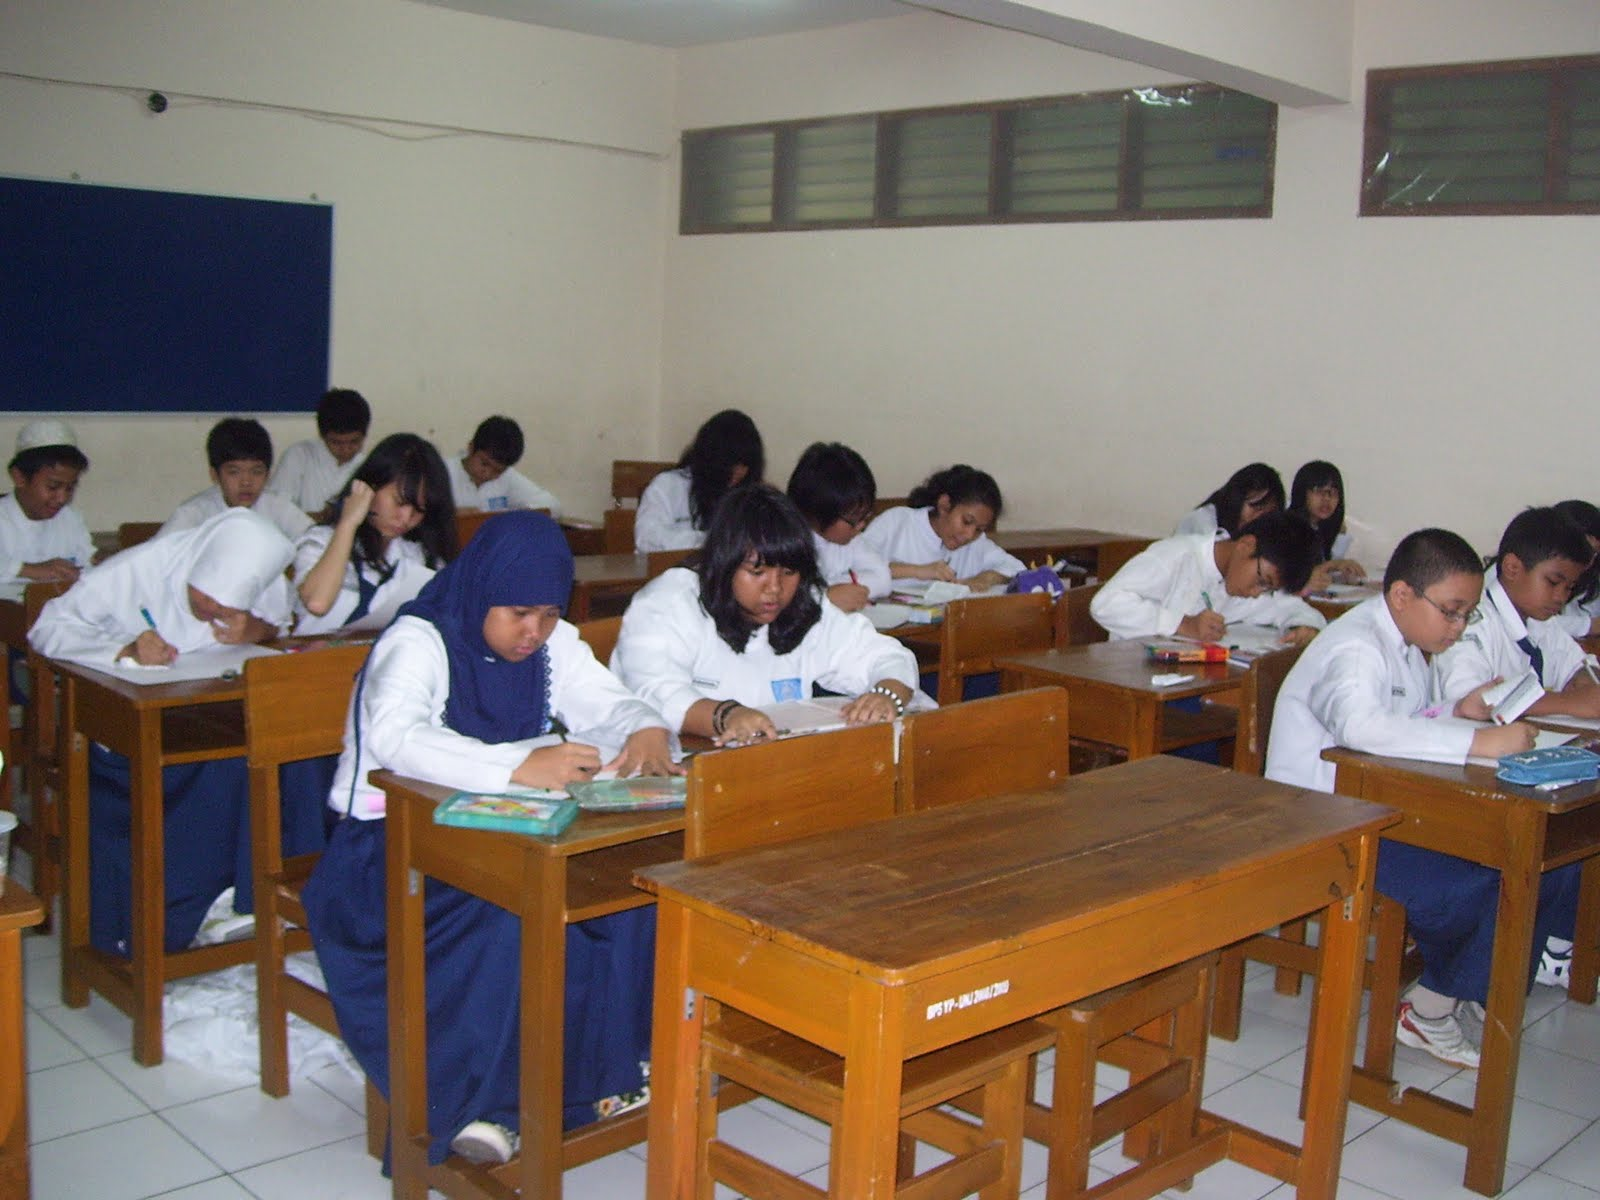 SMP Labschool Jakarta